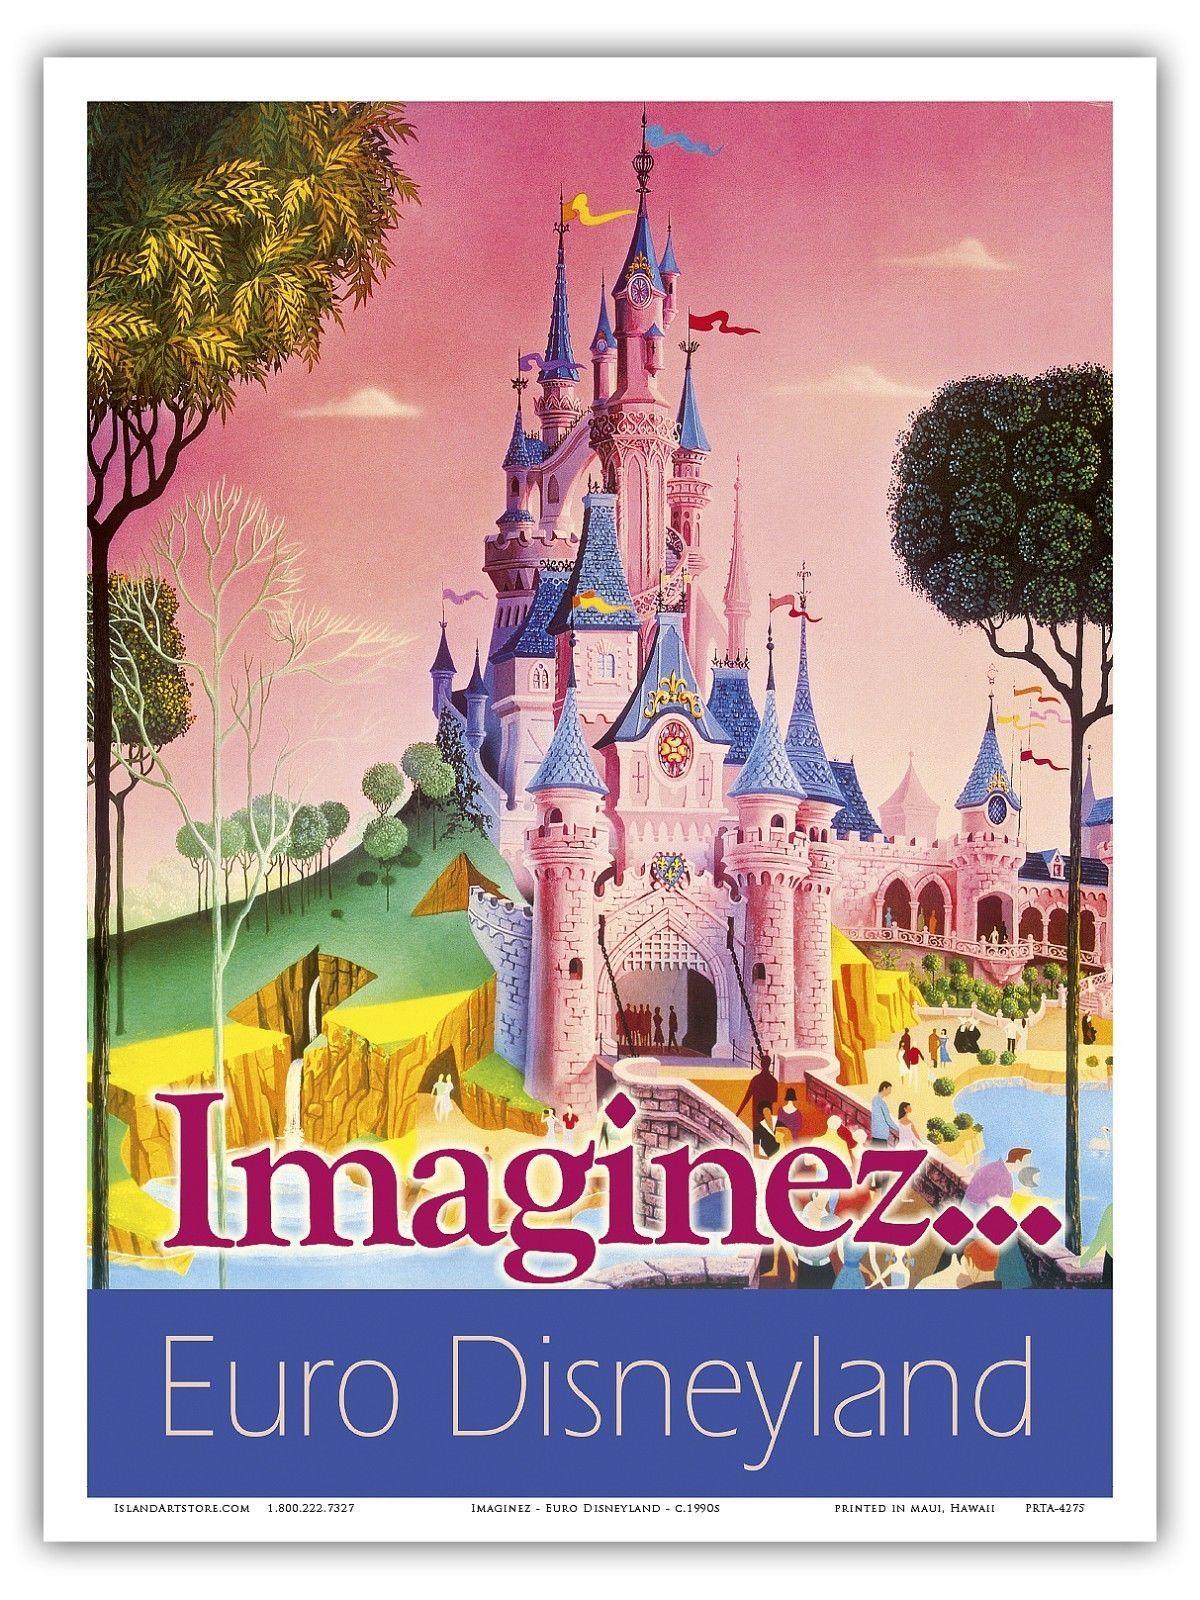 Euro Disneyland Paris France Vintage World Travel Art Poster Print